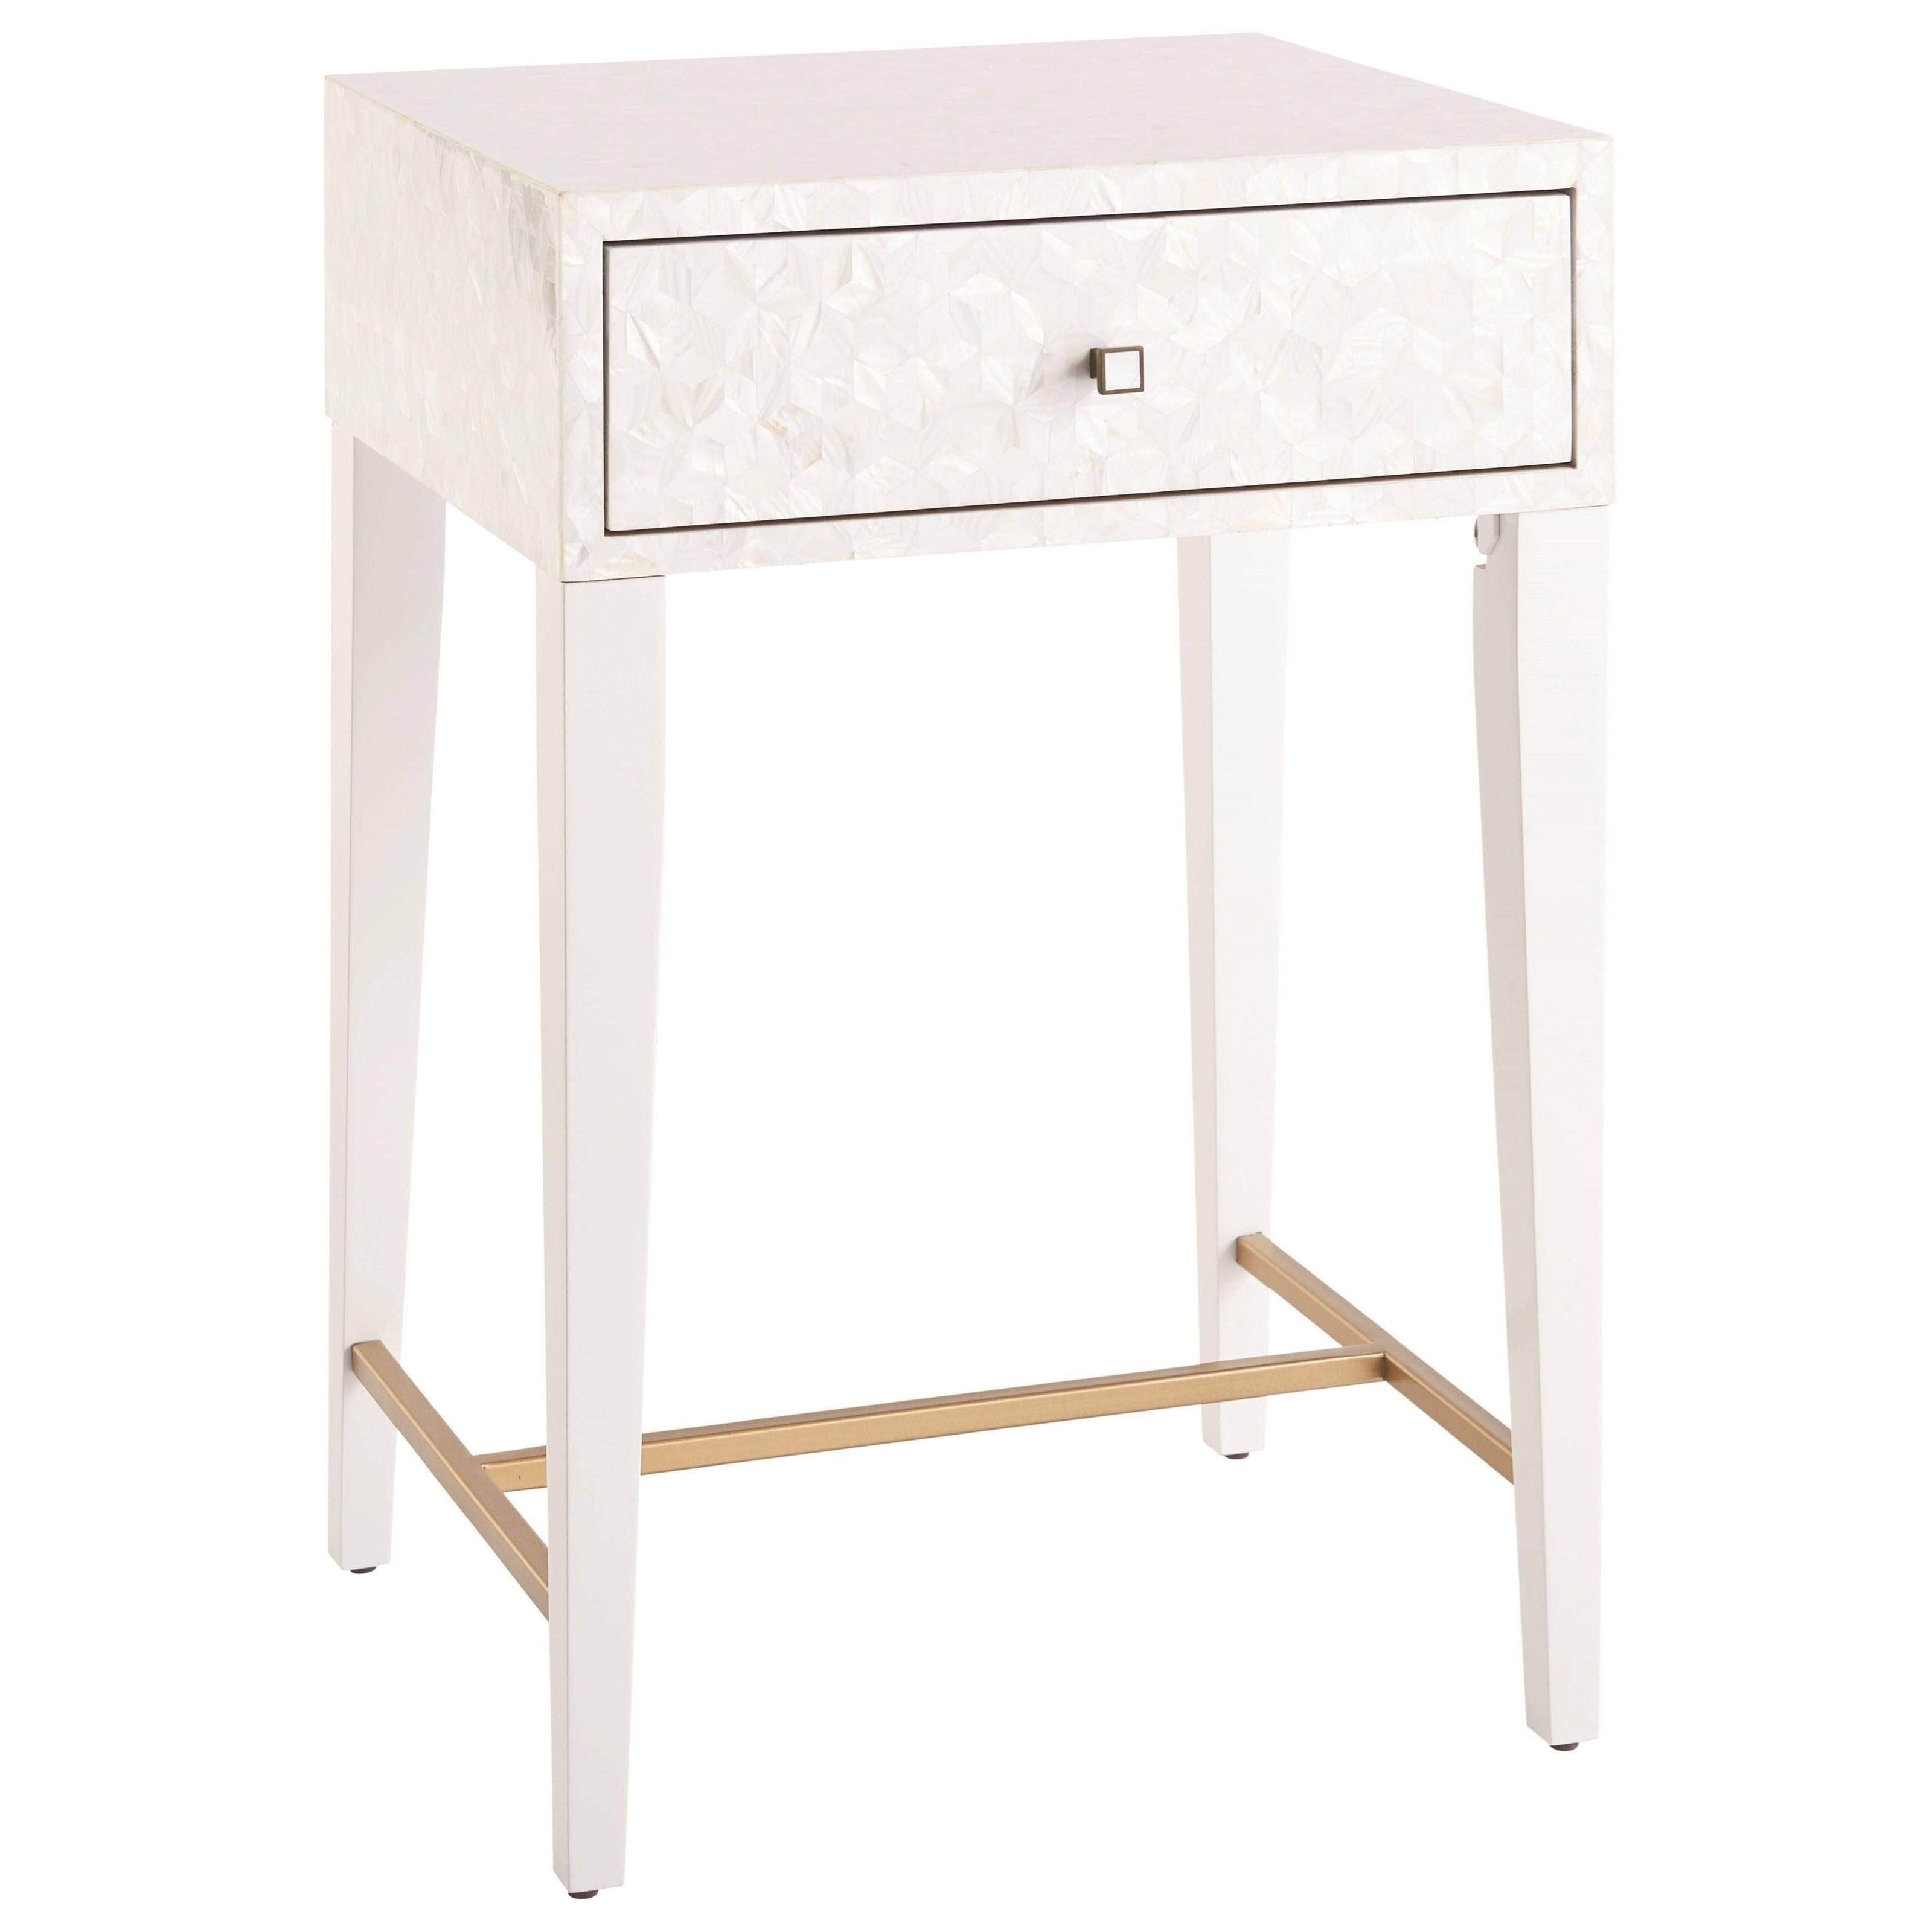 Love. Joy. Bliss.-Miranda Kerr Home Bedside Table by Universal at Baer's Furniture